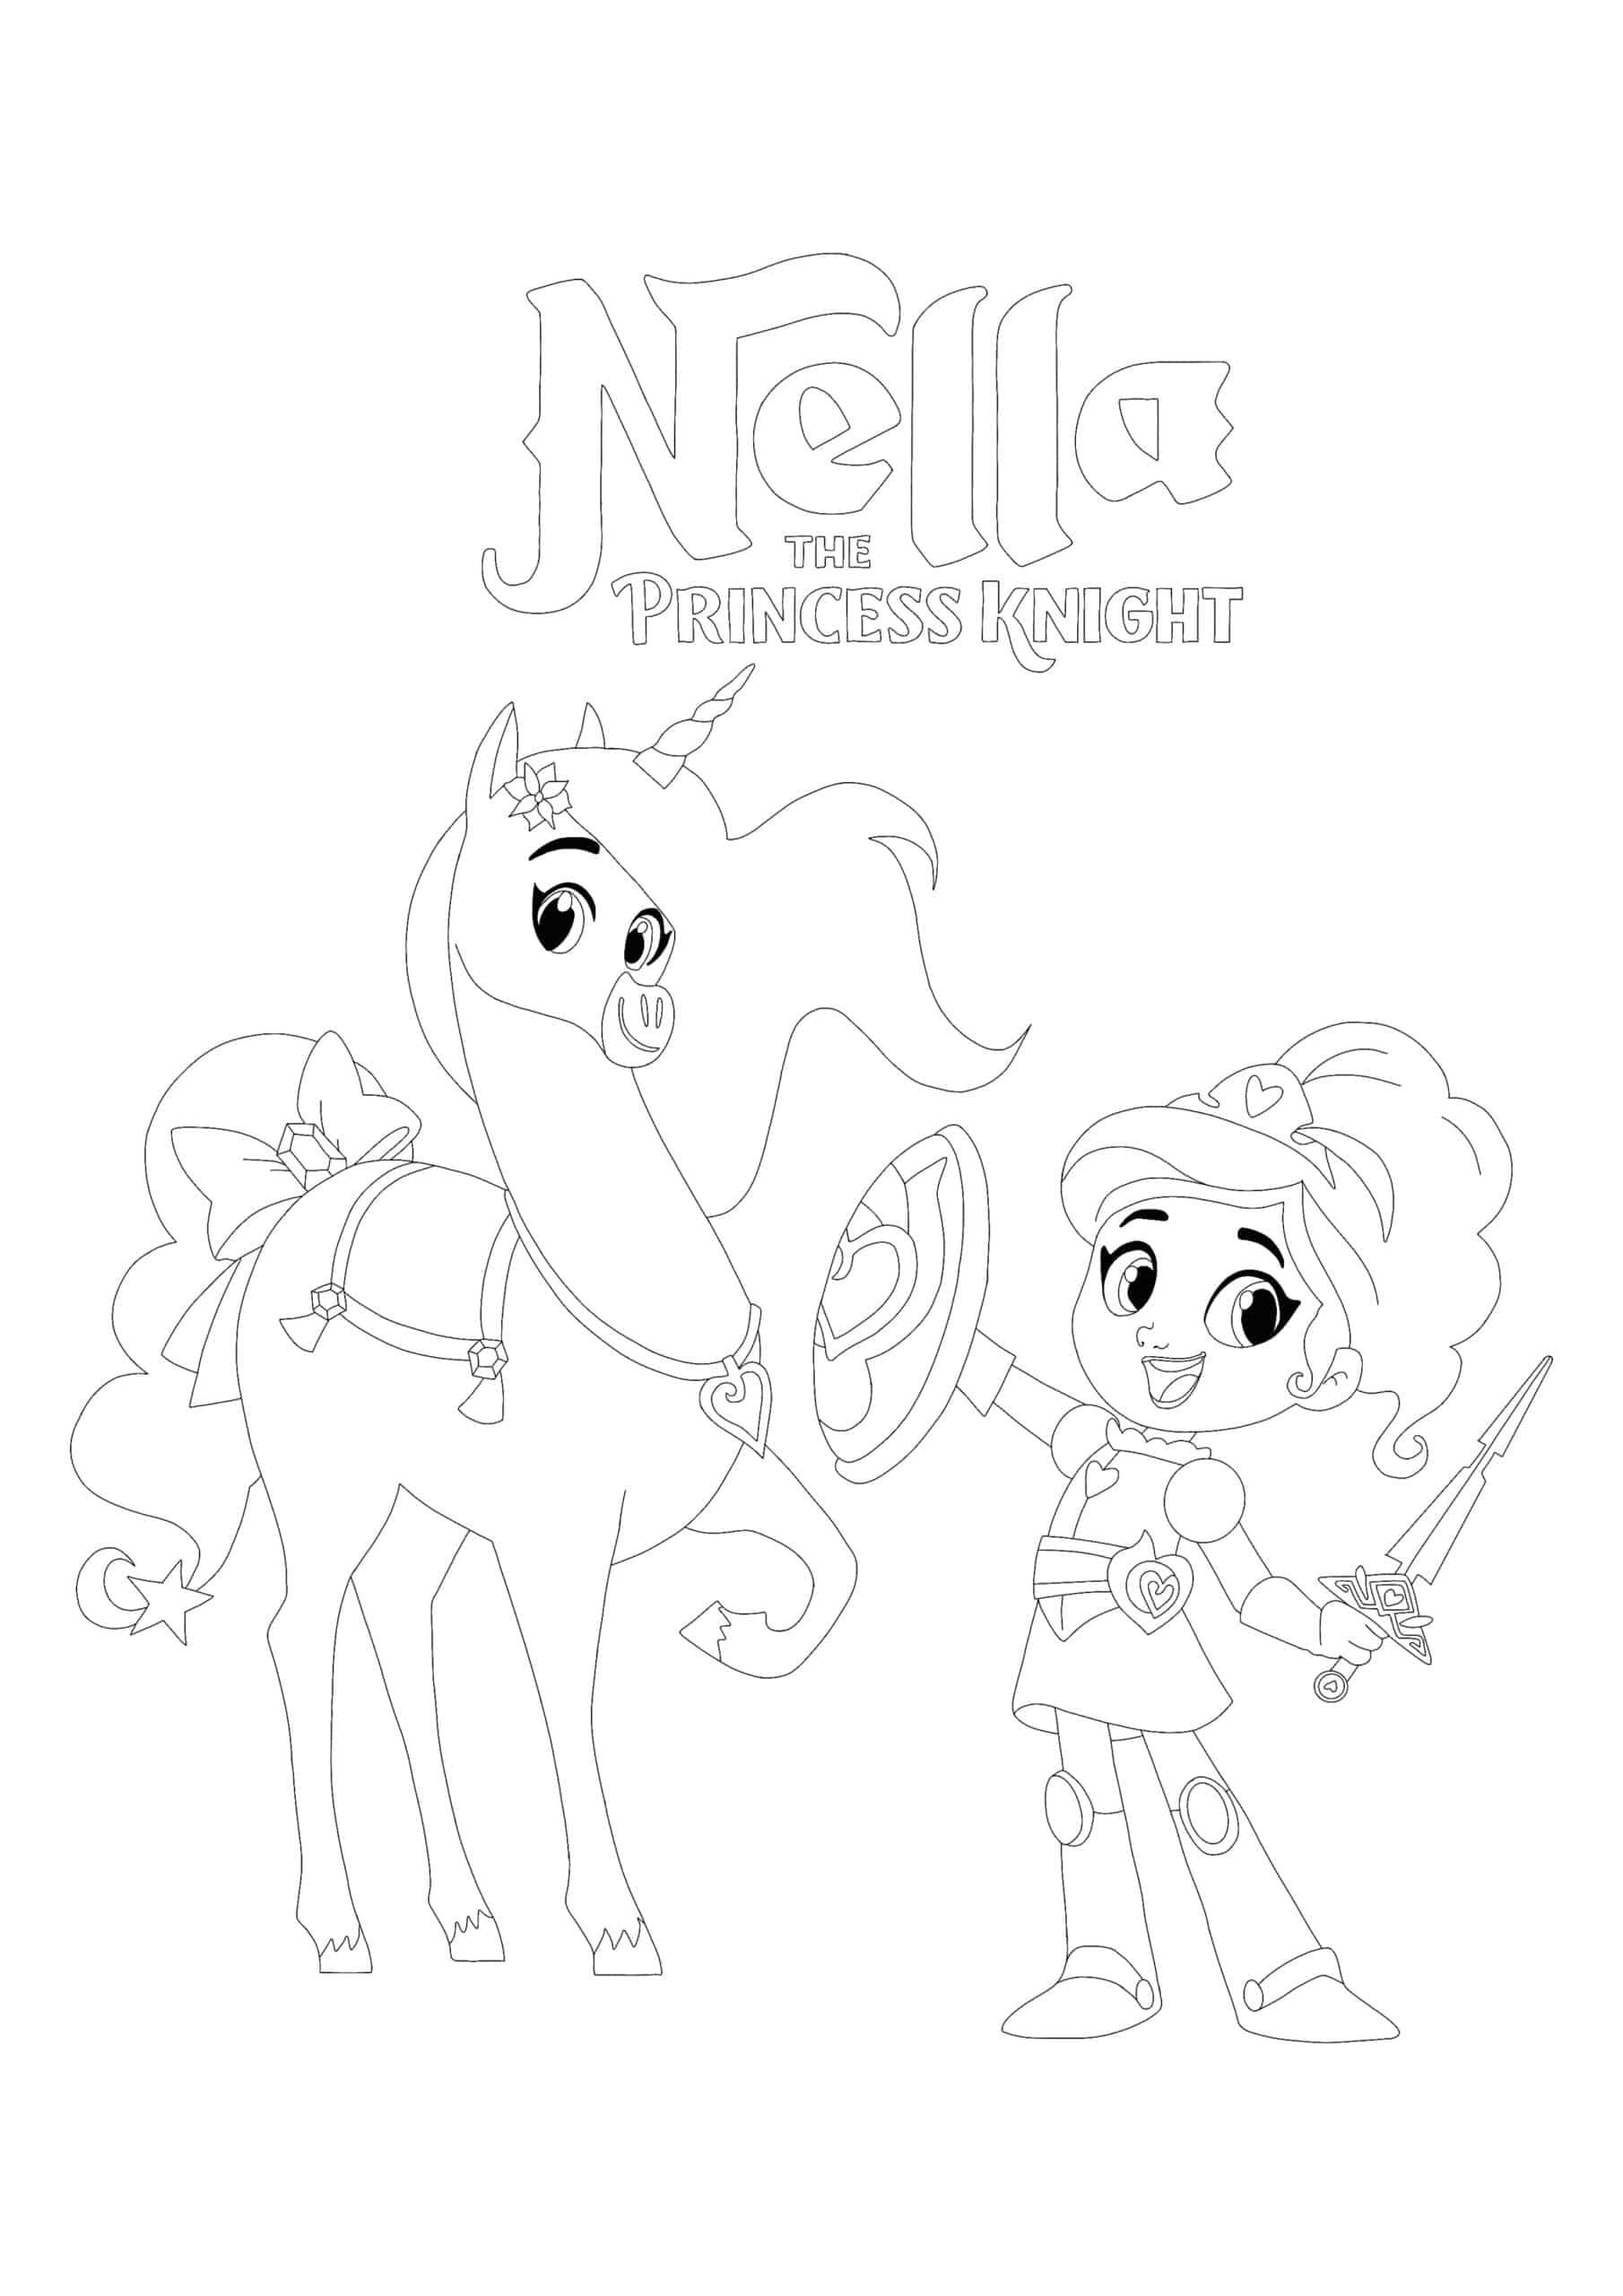 Princess Nella and Unicorn Trinket coloring page